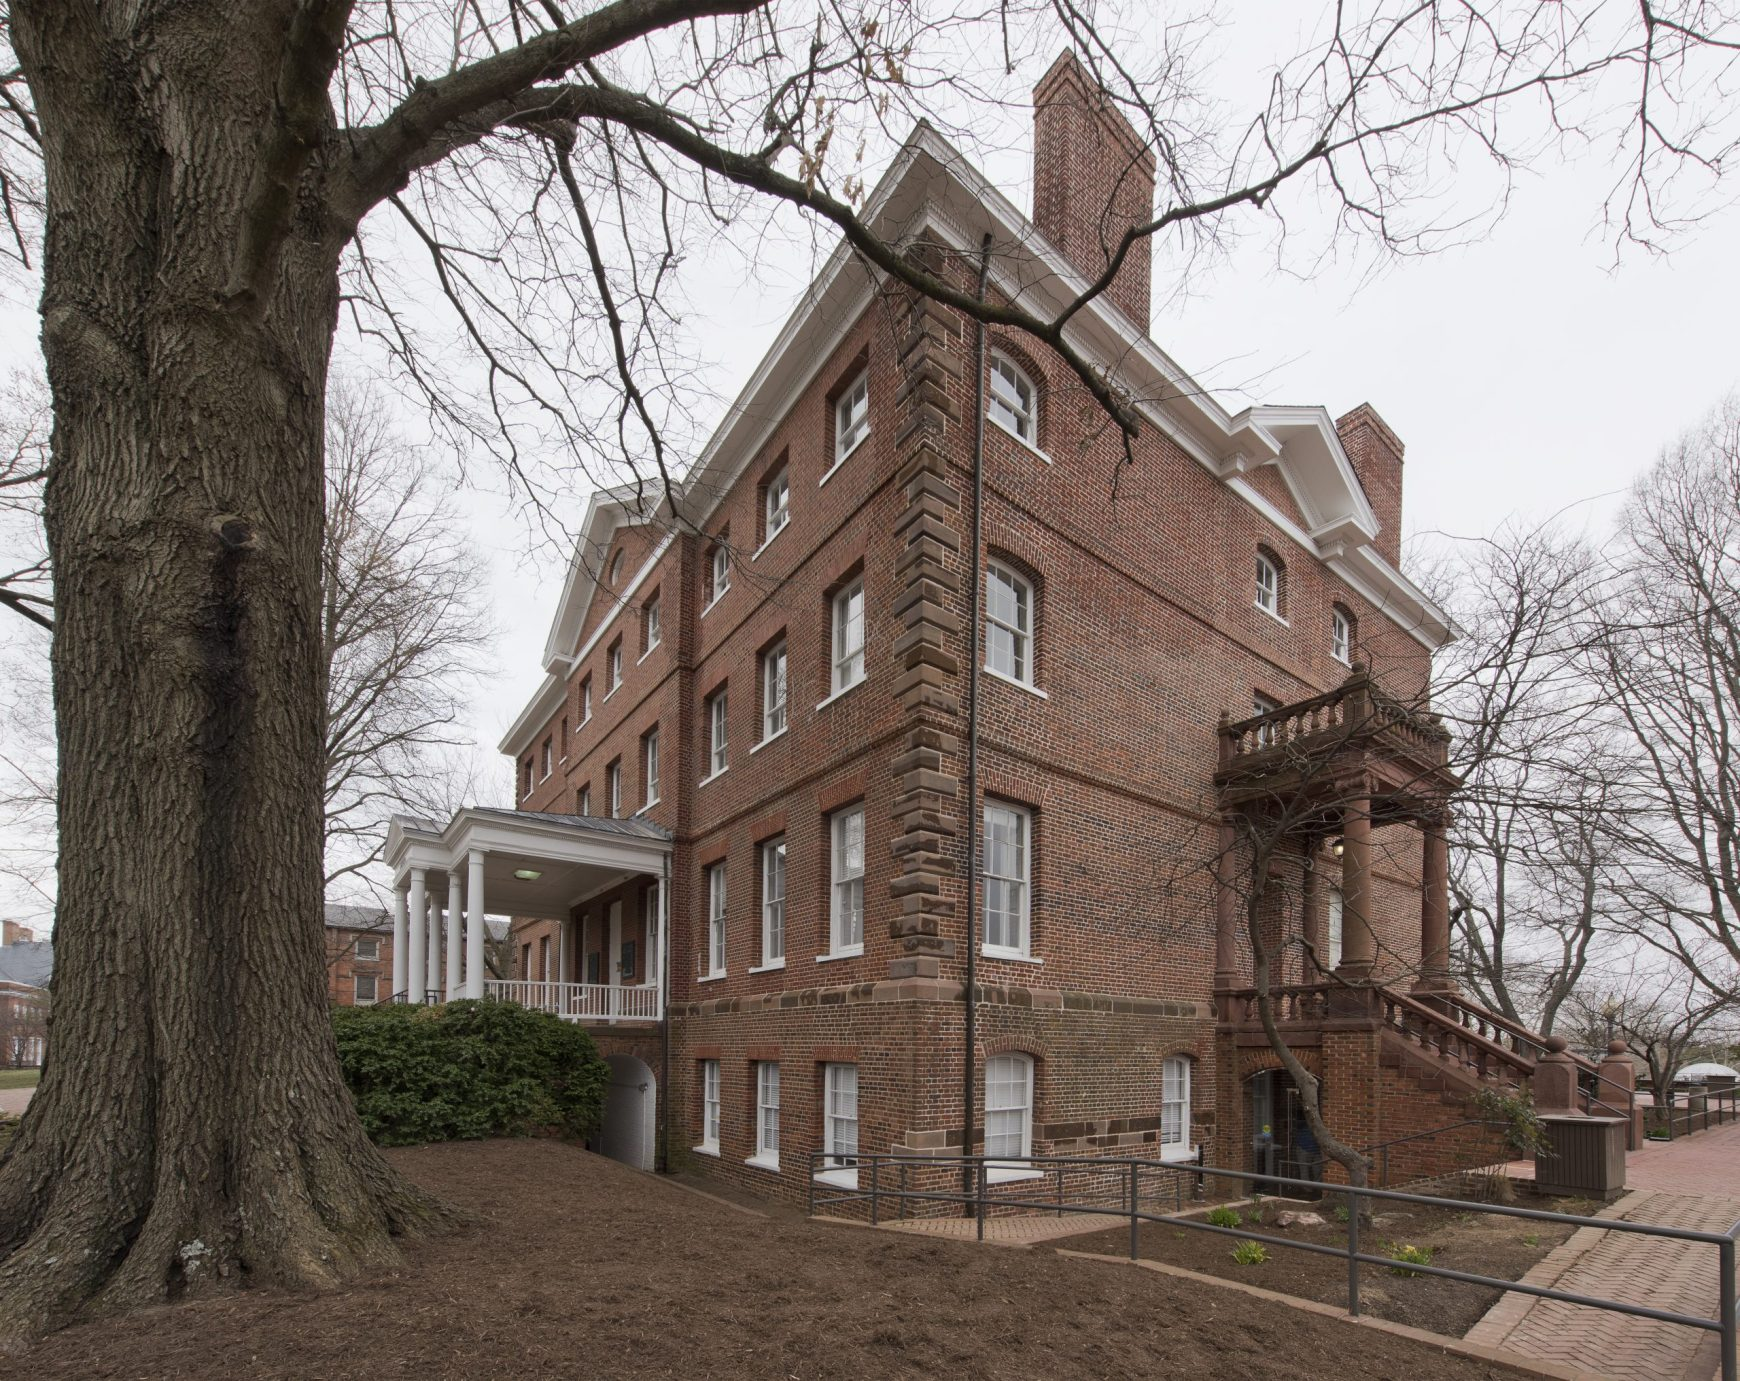 McDowell Hall